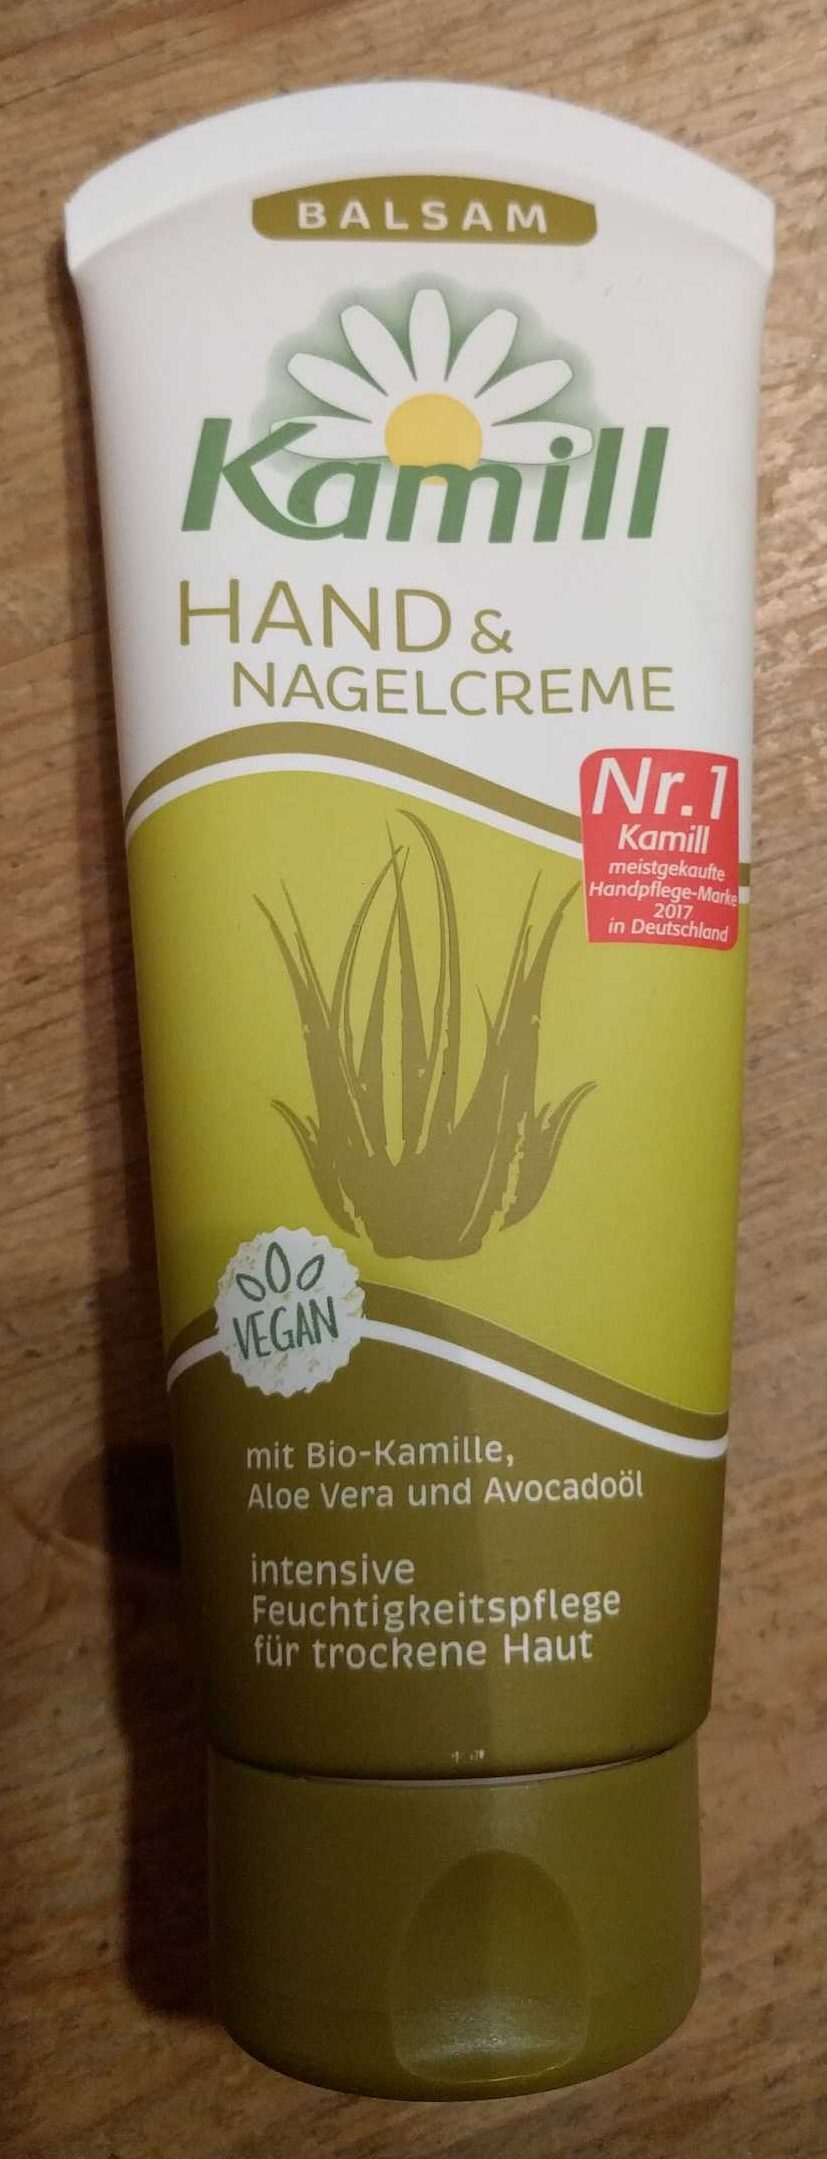 Hand & Nagelcreme - Product - de